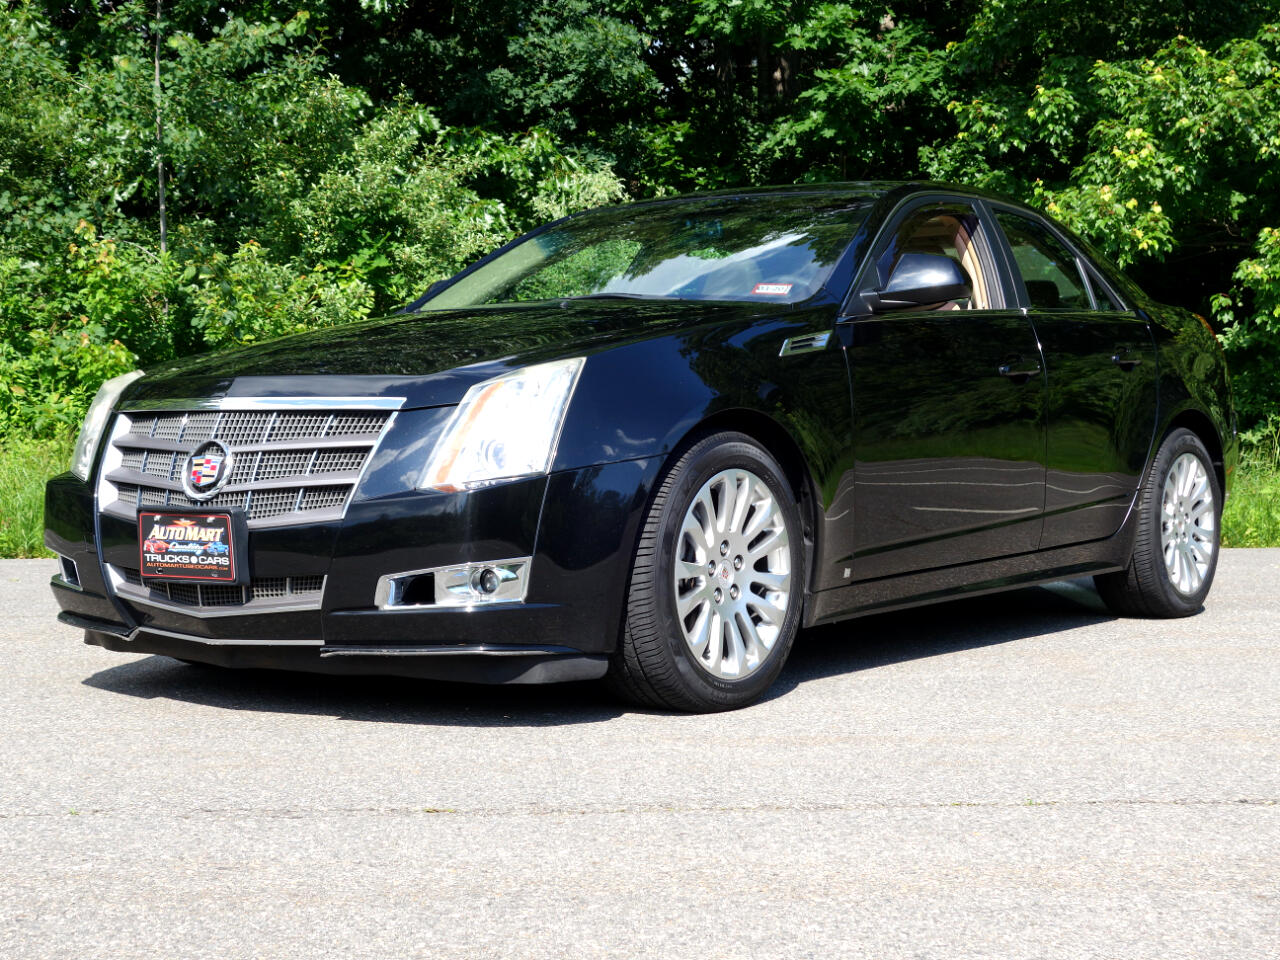 2010 Cadillac CTS Sedan 4dr Sdn 3.6L Performance AWD